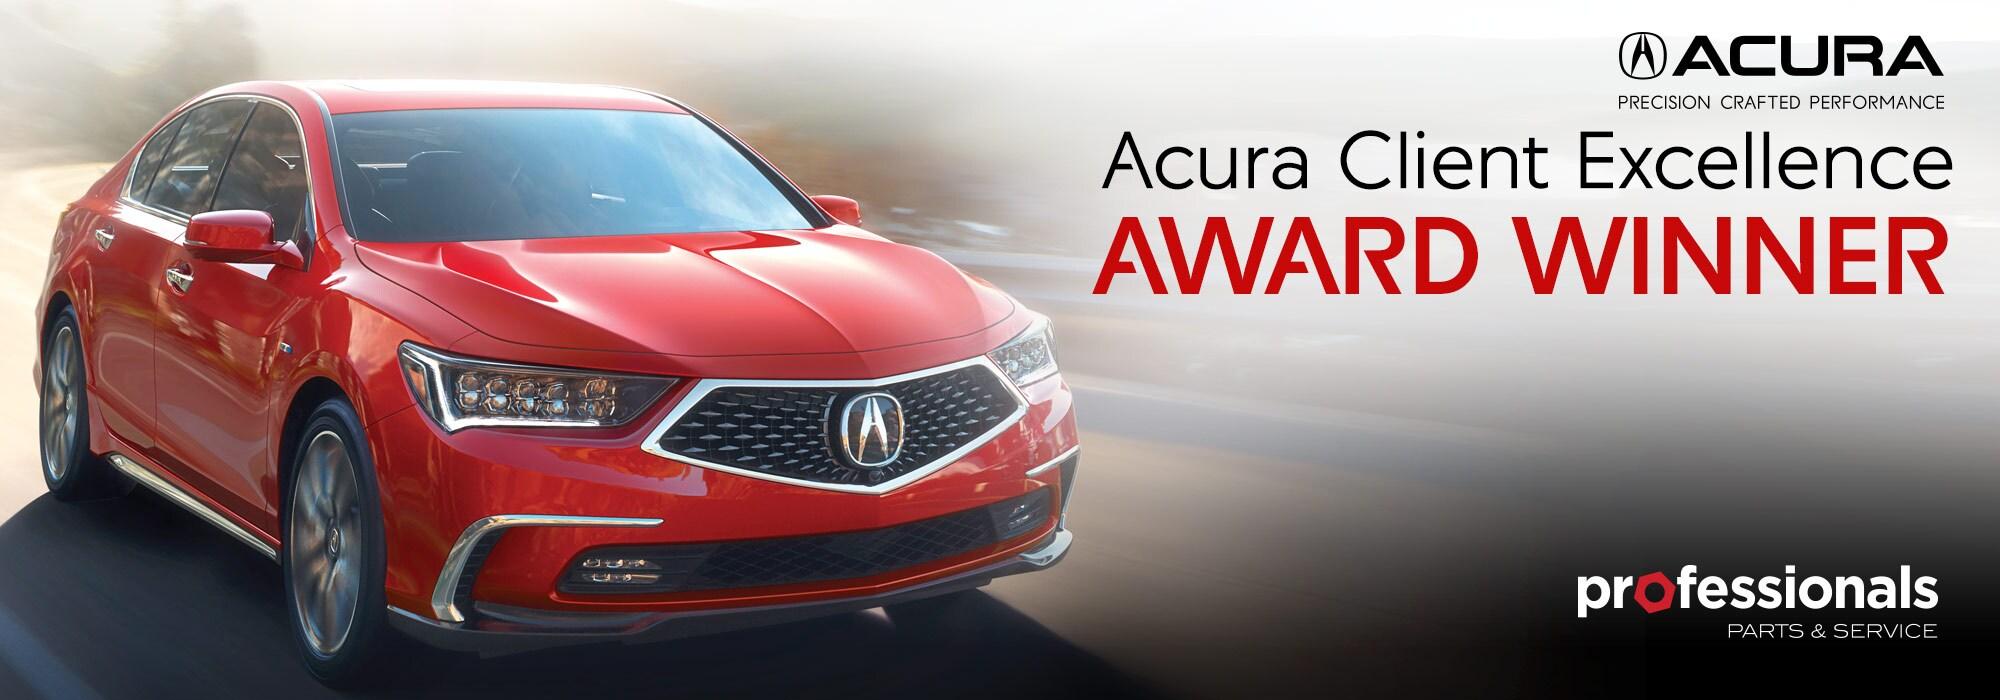 elite serving auto tl detail used brokers md in tech sedan dealers at acura